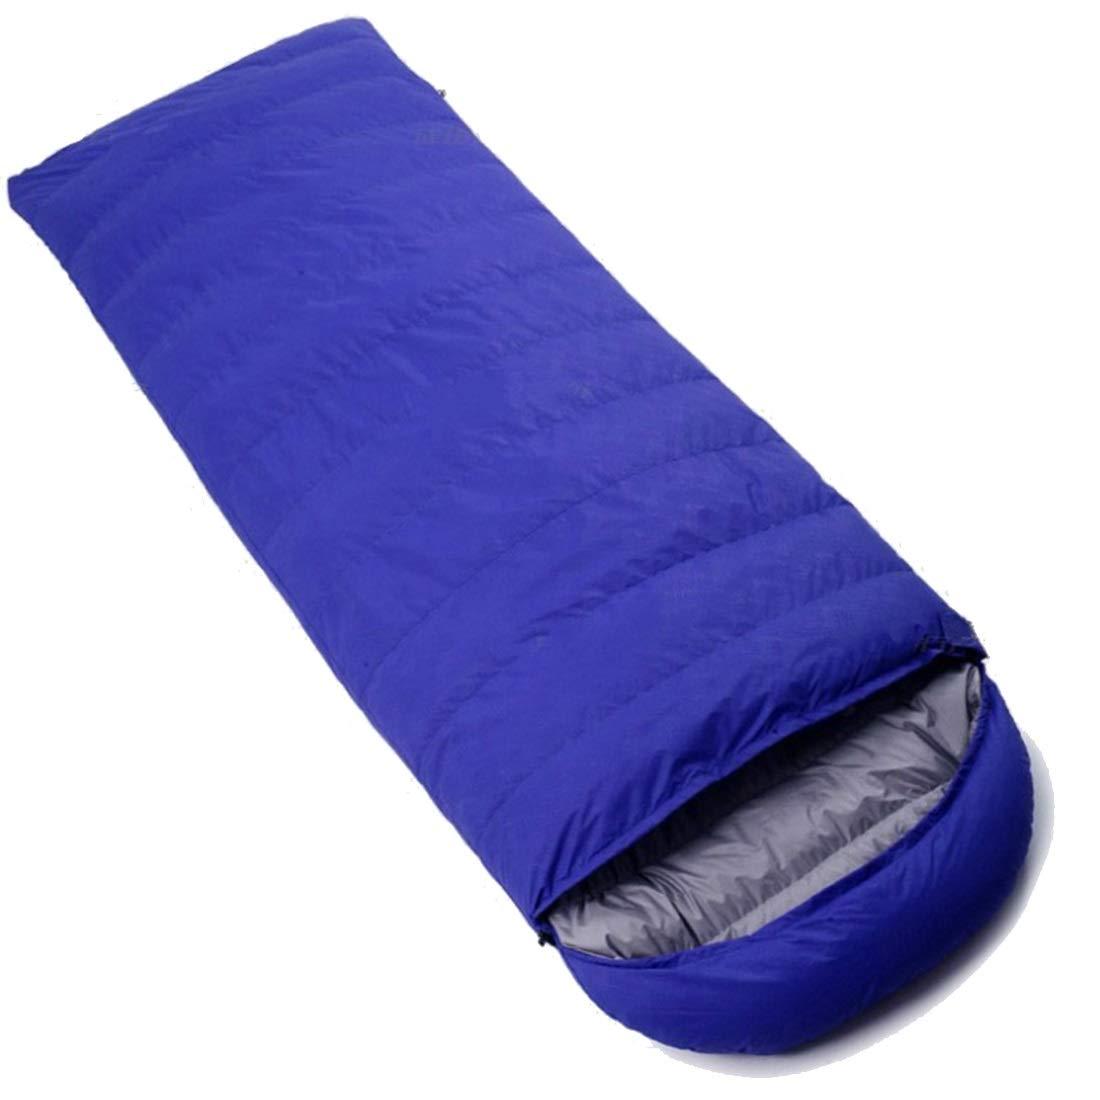 Koloeplf : 圧縮サックを持つ快適な大人の封筒軽量寝袋 (Color : Yellow (Color black, サイズ : 1000g) 1200g B07LDZ94NK ブルー 1200g 1200g|ブルー, ボタ二カルラボ:1e4e5d53 --- ijpba.info